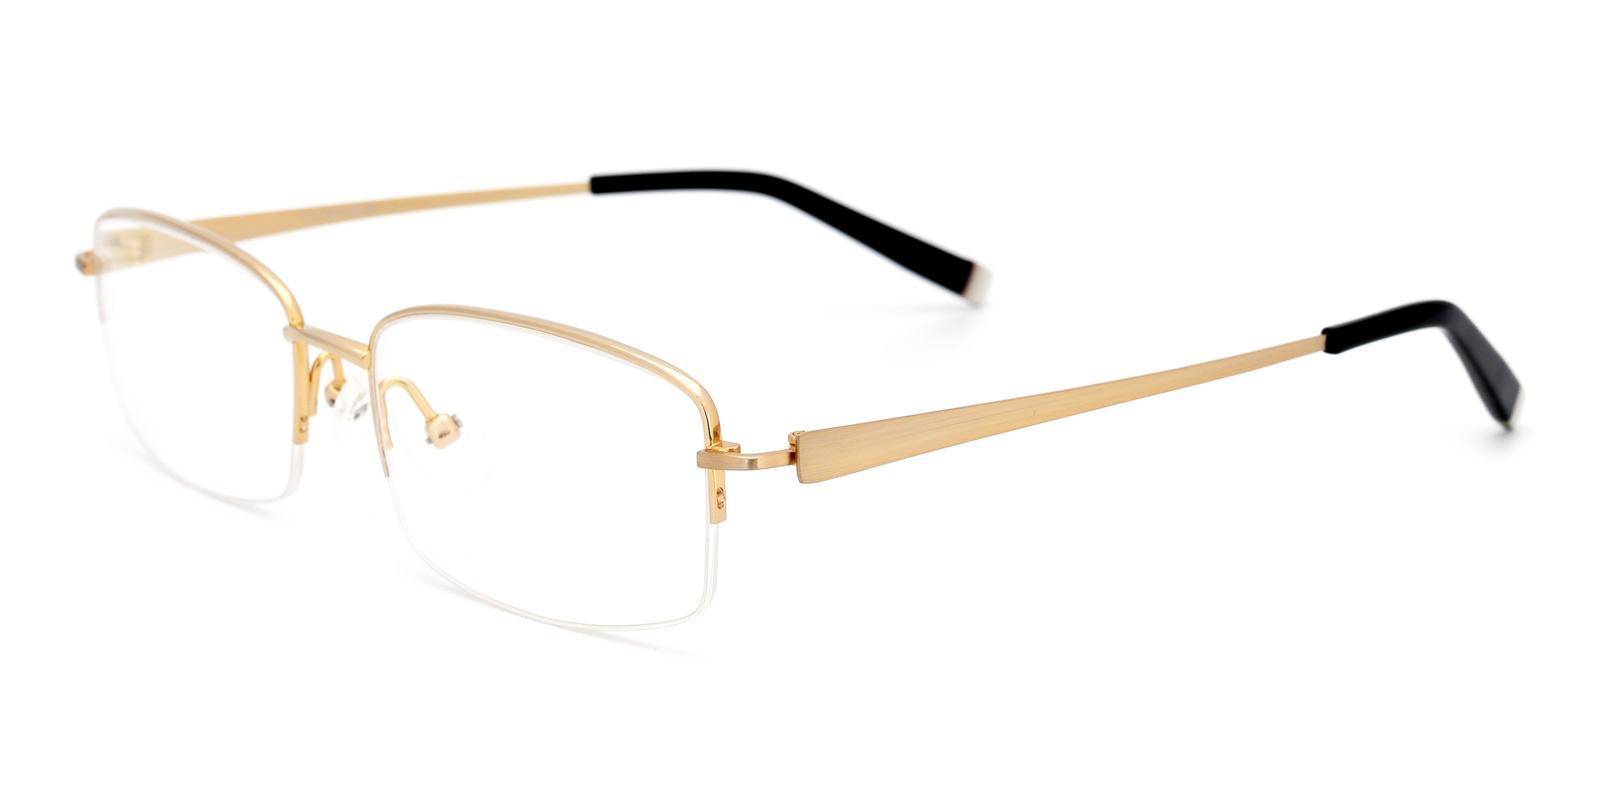 Leave-Gold-Rectangle-Titanium-Eyeglasses-detail